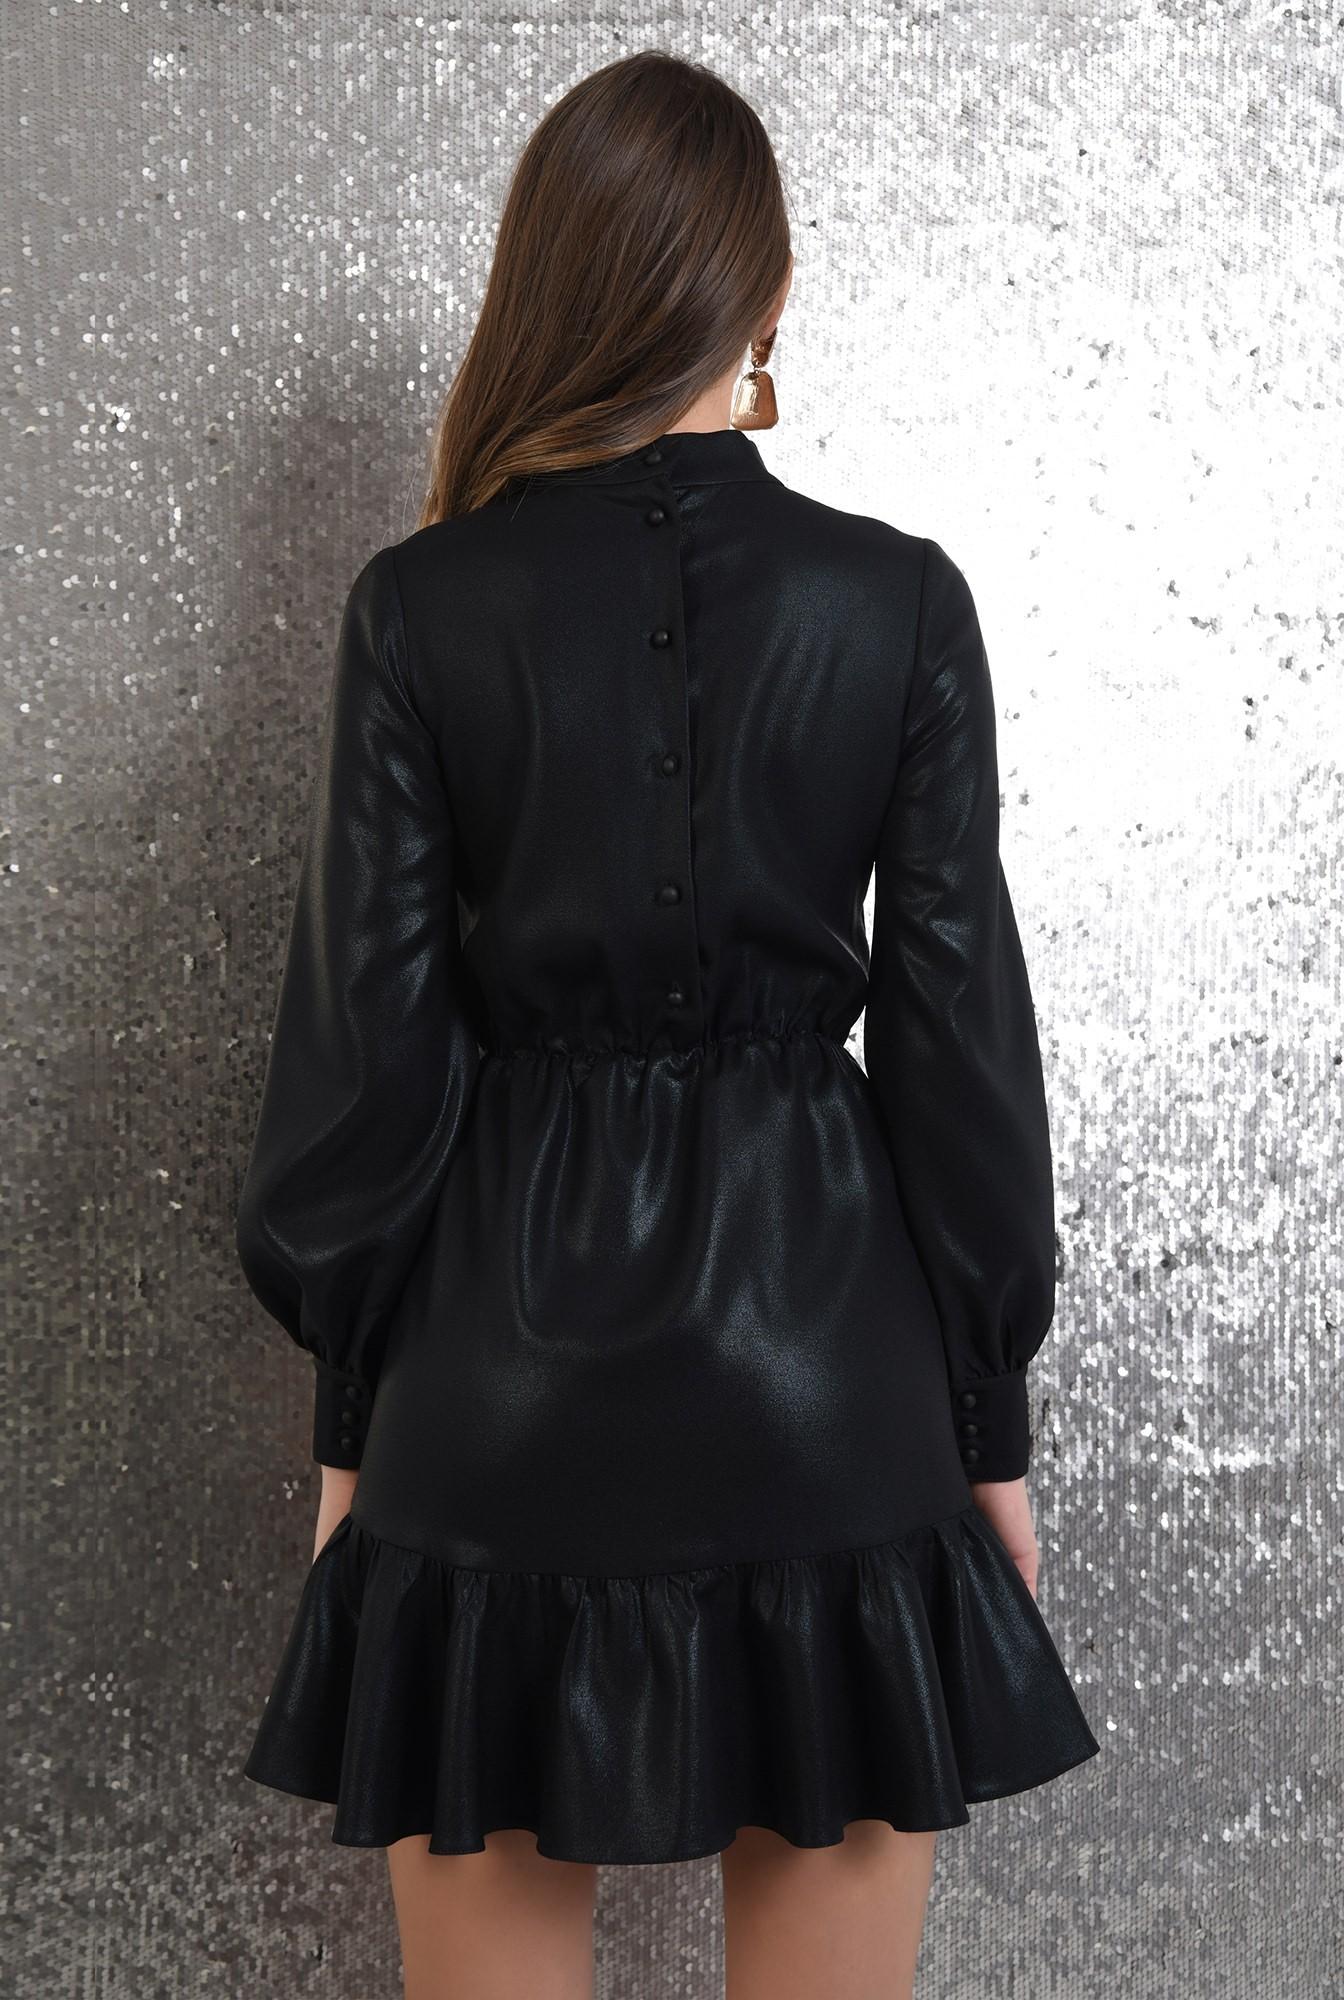 1 - rochie neagra, de ocazie, croi petrecut, nasturi la spate, Poema